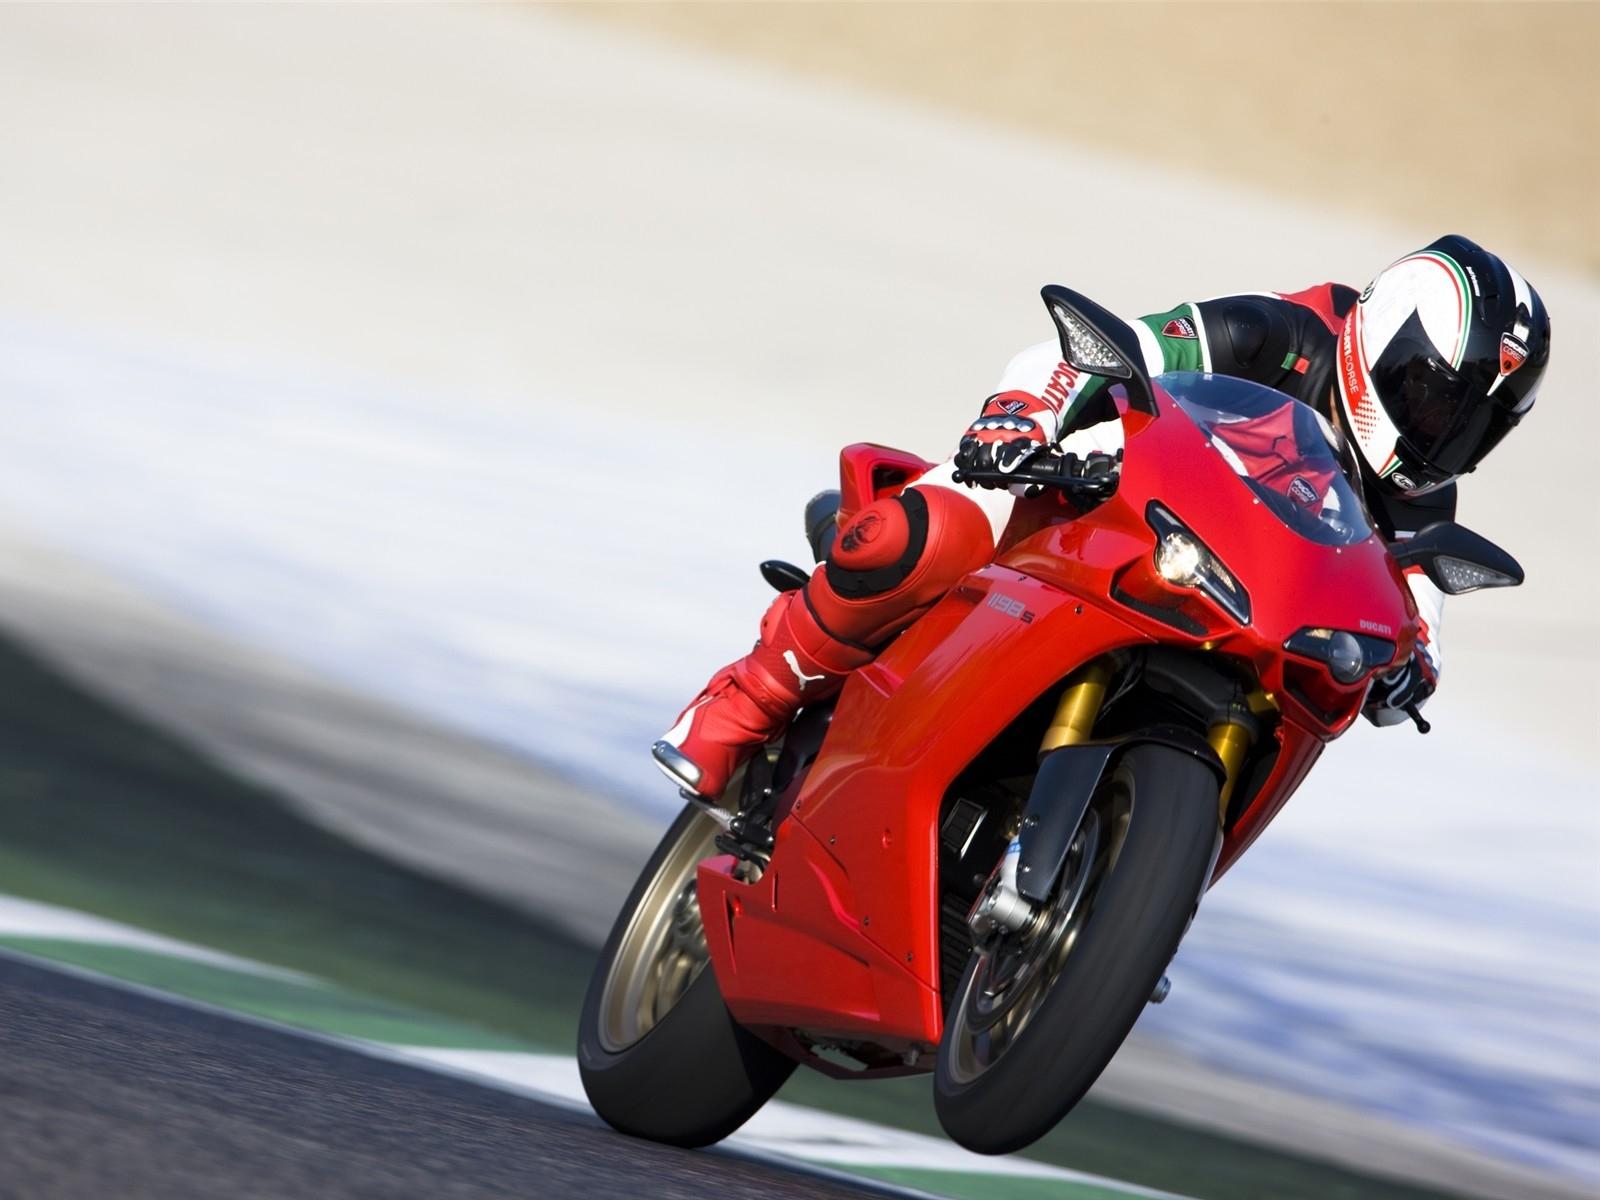 Ducati Superbike Hd Pics